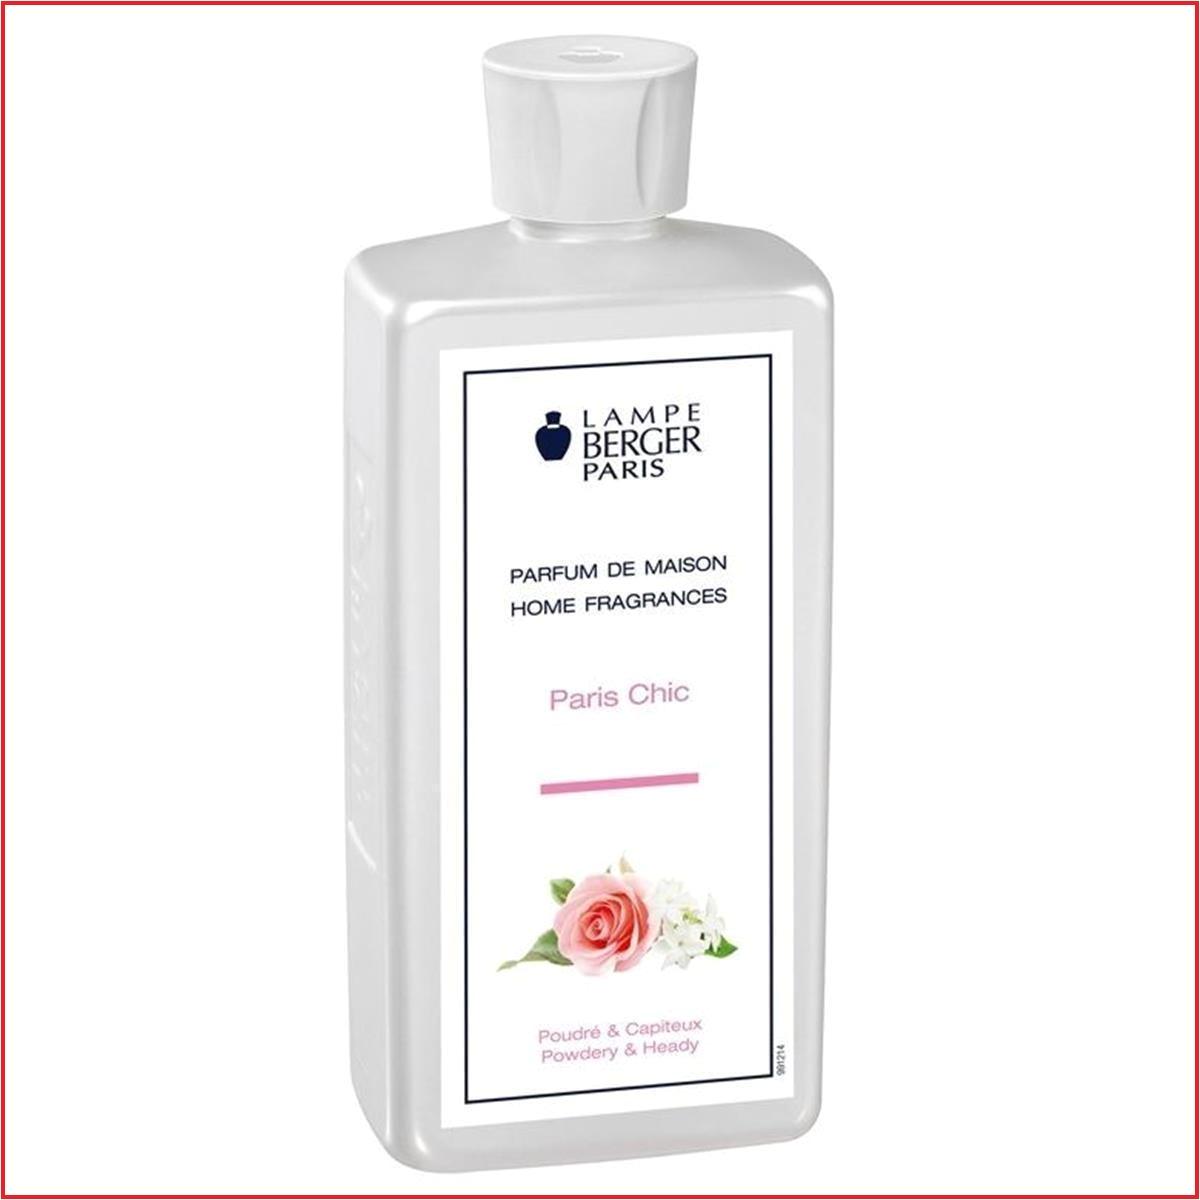 lamp de berger 653135 lampe berger parfum de maison lamp perfume refill flower dreams